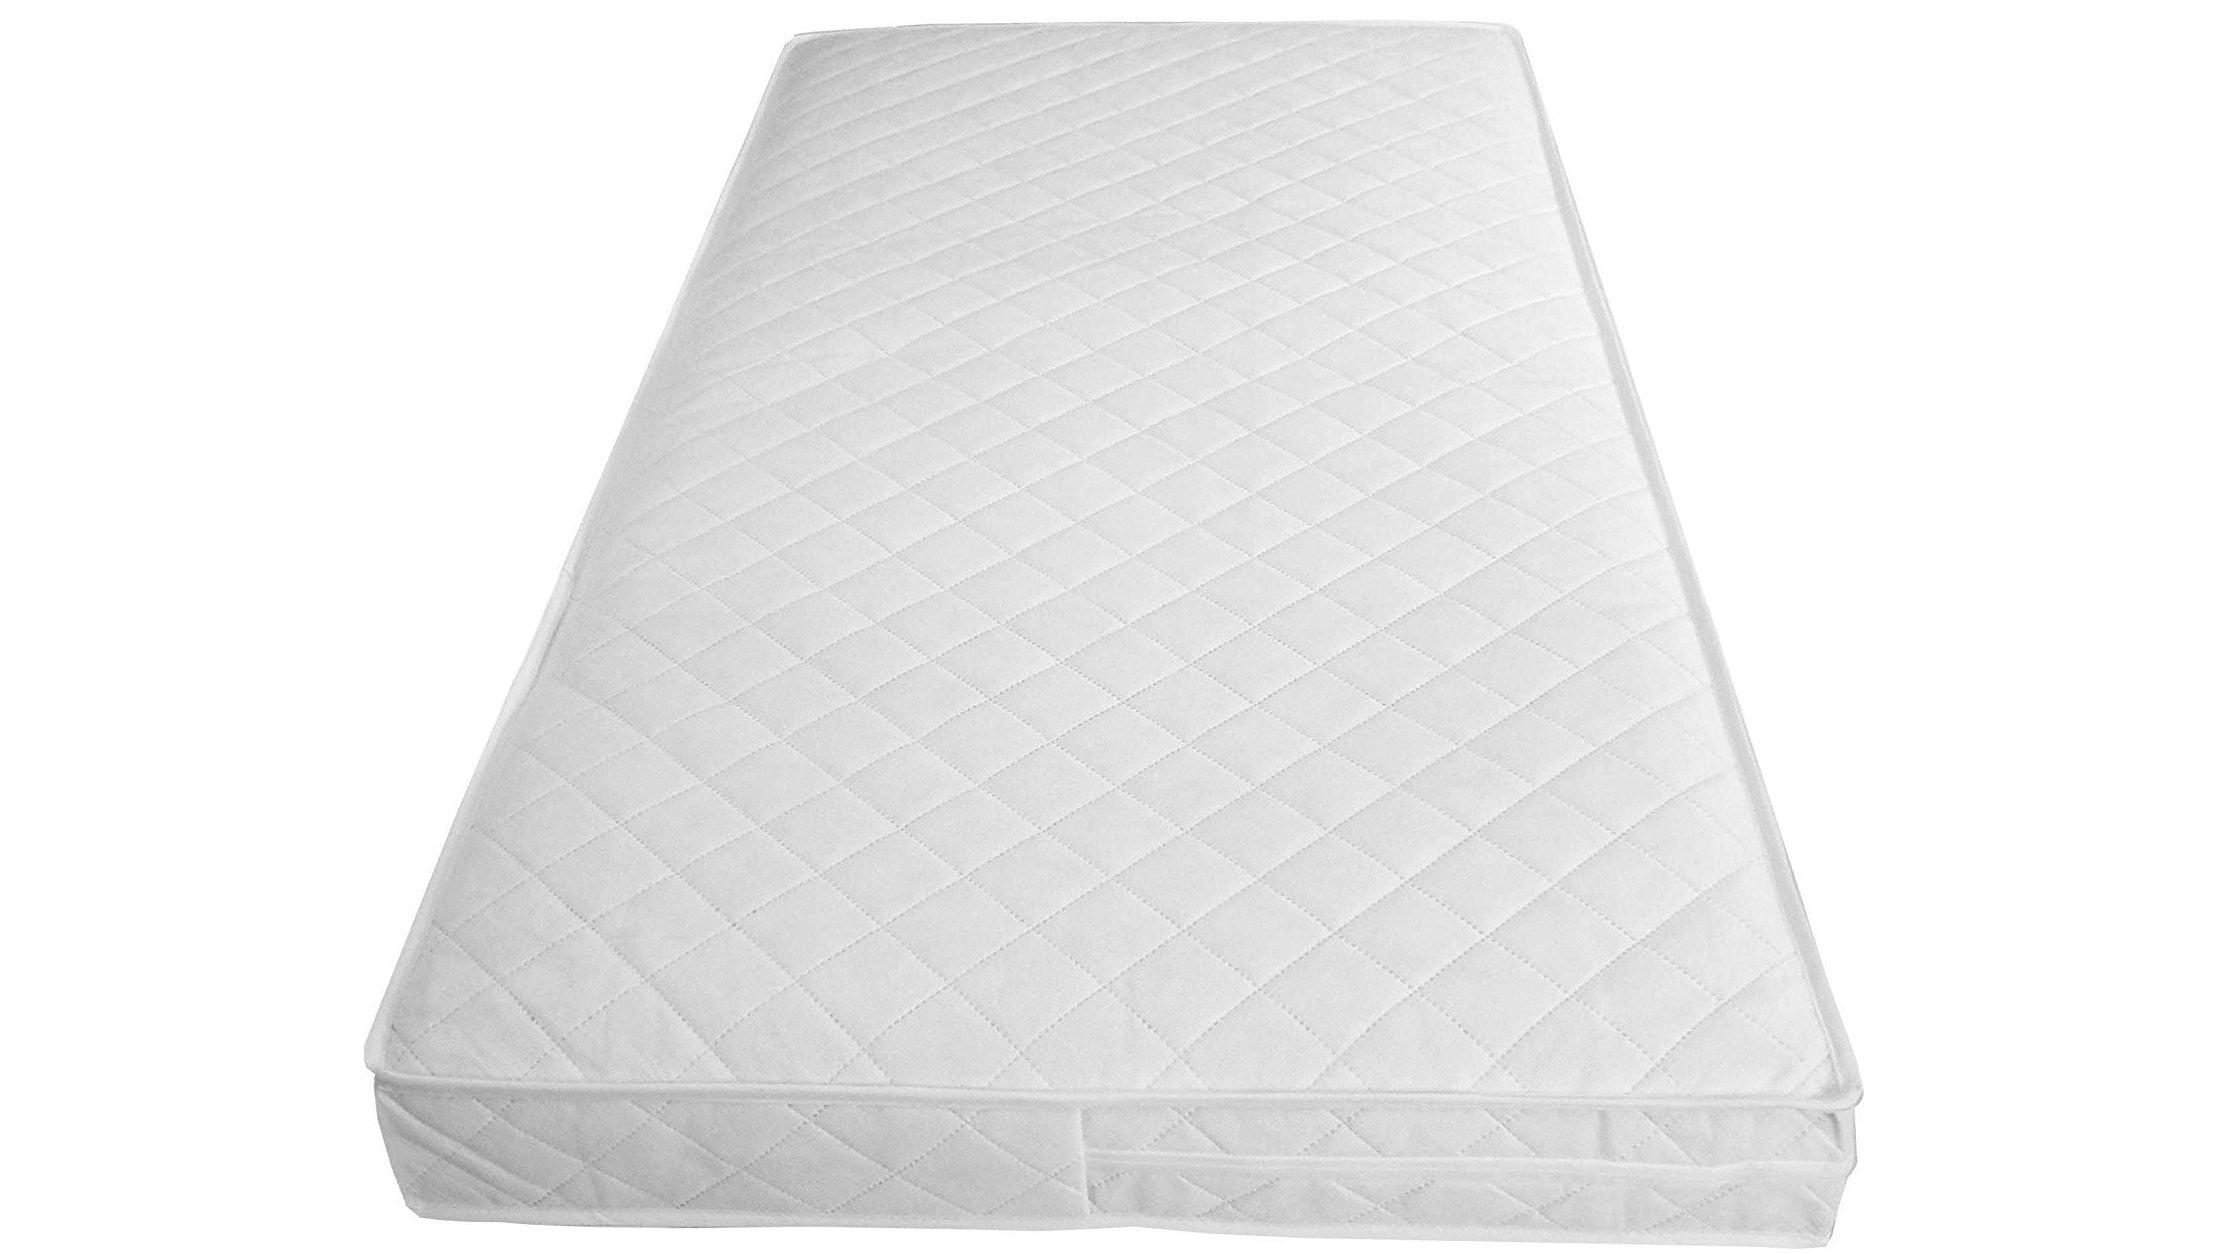 huge selection of 41fd2 c1915 Best cot mattress: Foam, fibre, spring, travel cot and cot ...